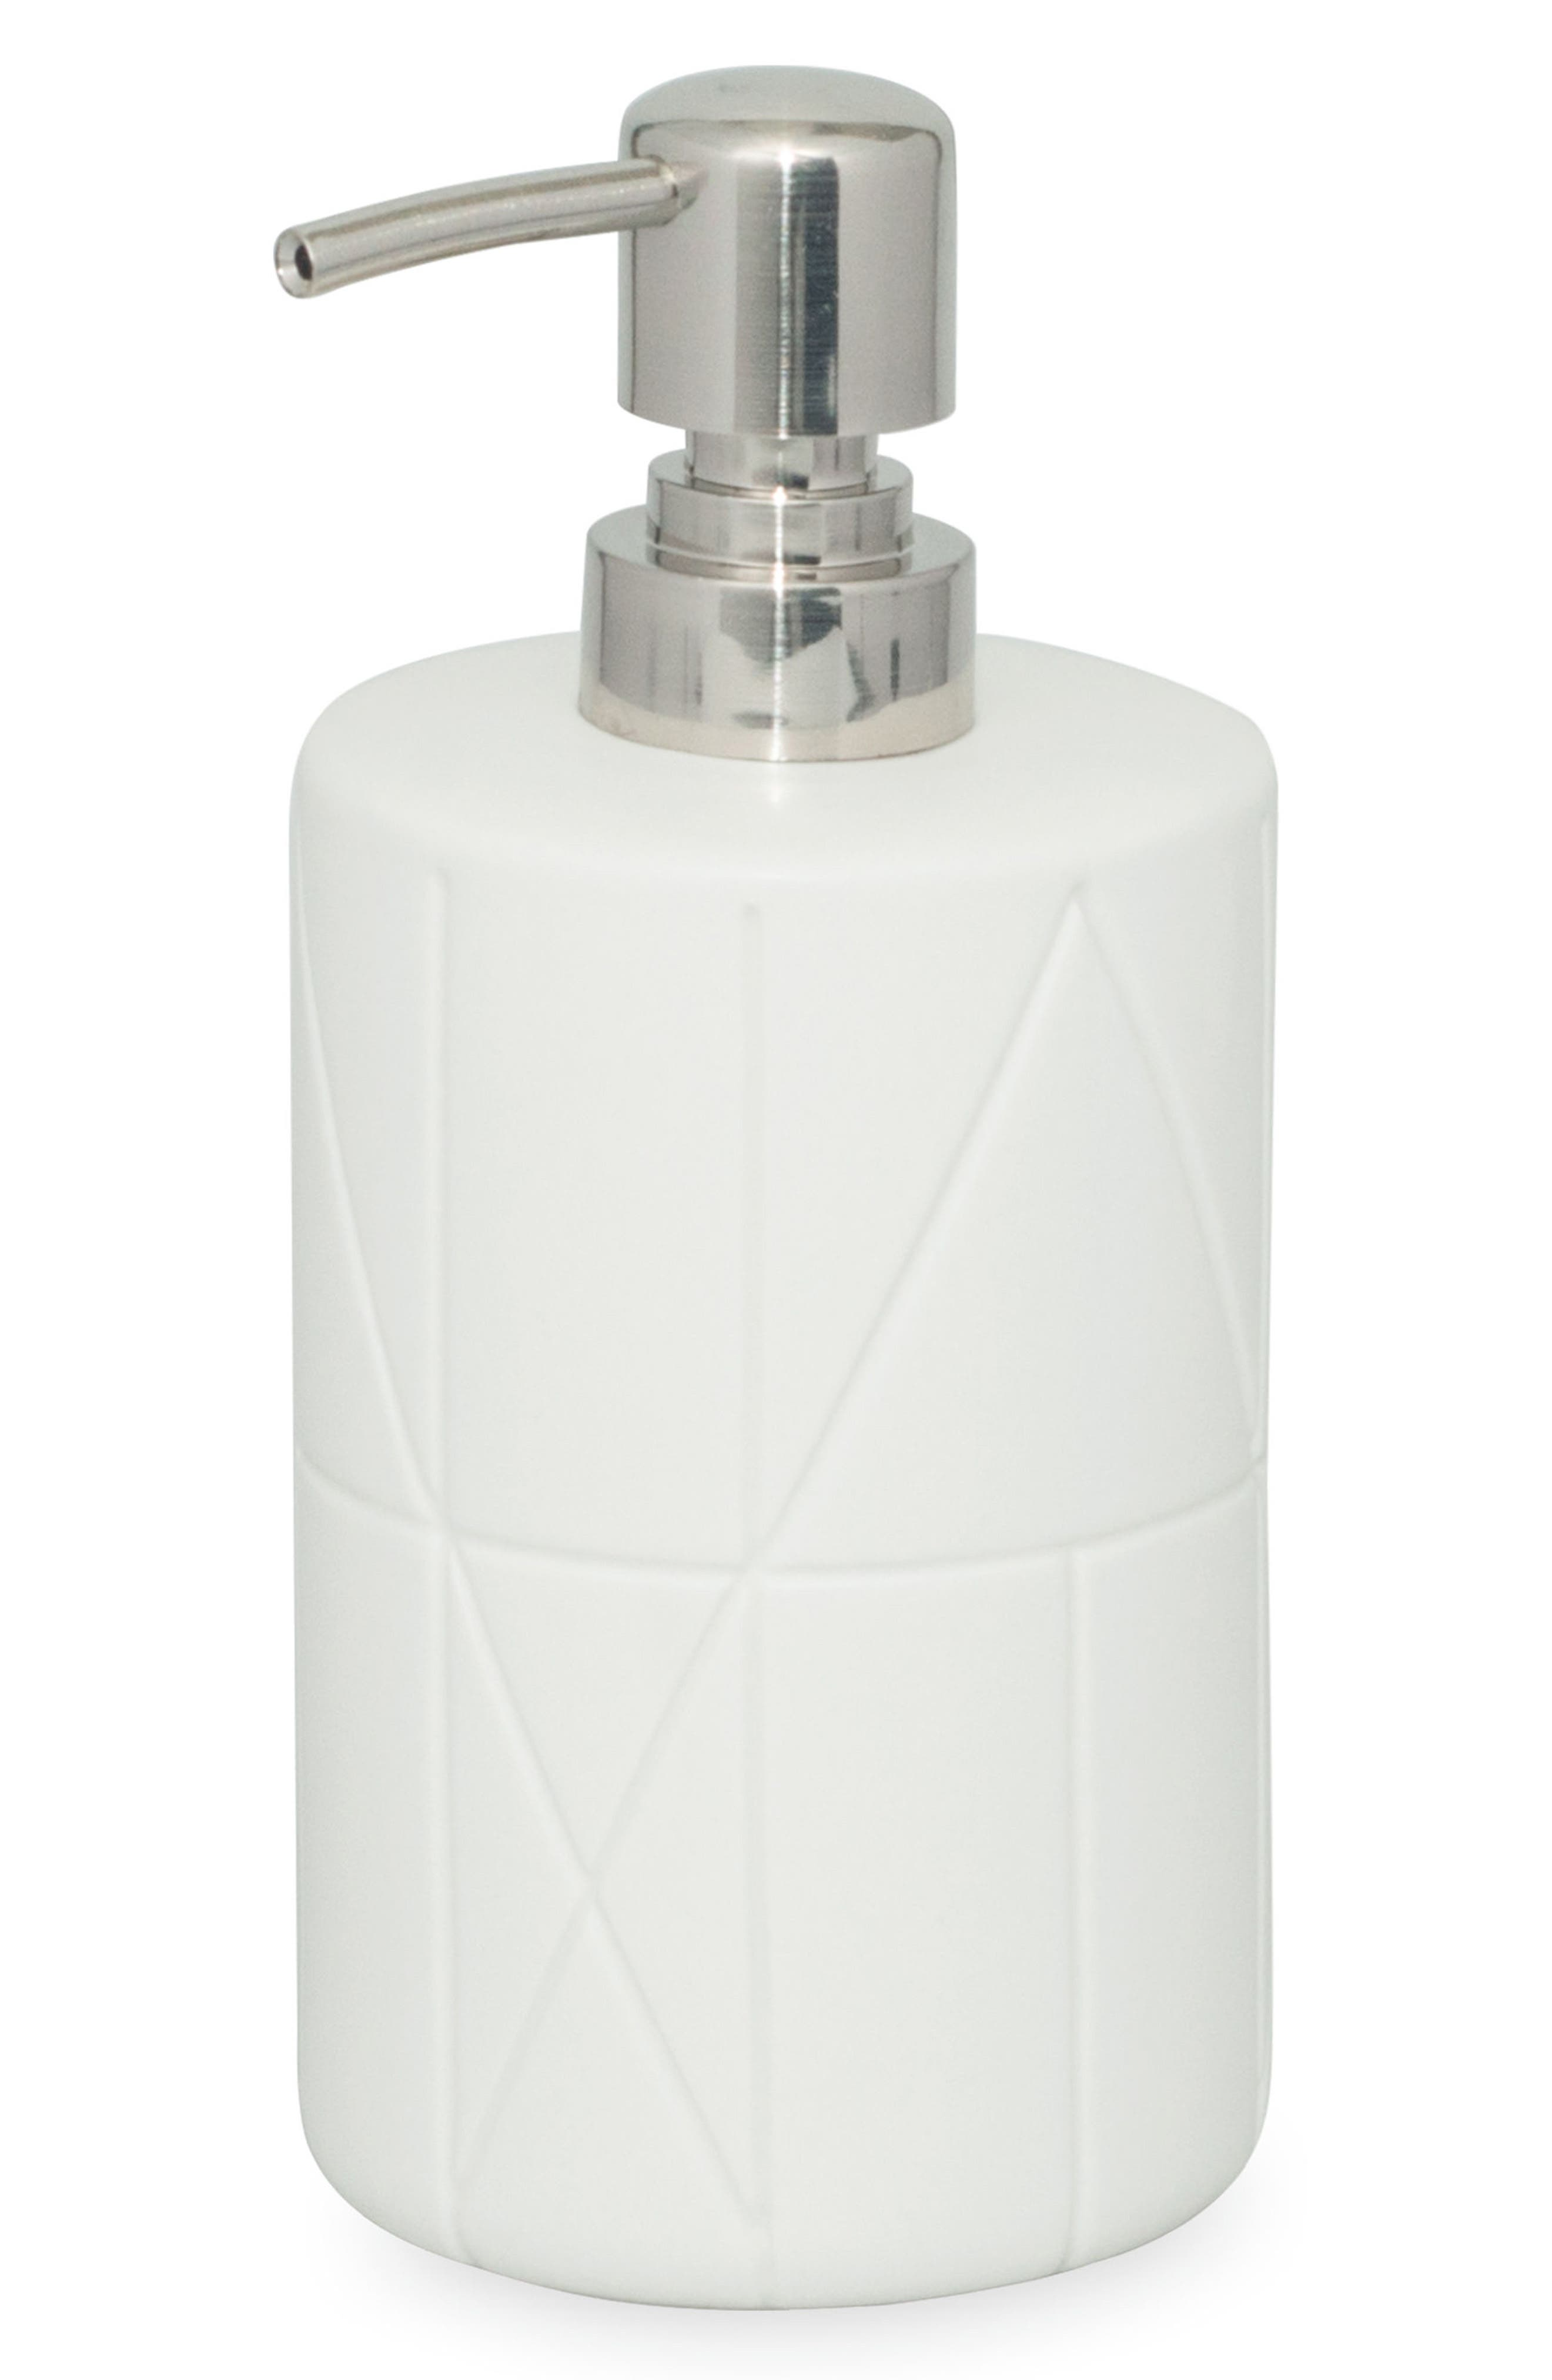 Main Image - DKNY Geometrix Lotion Pump